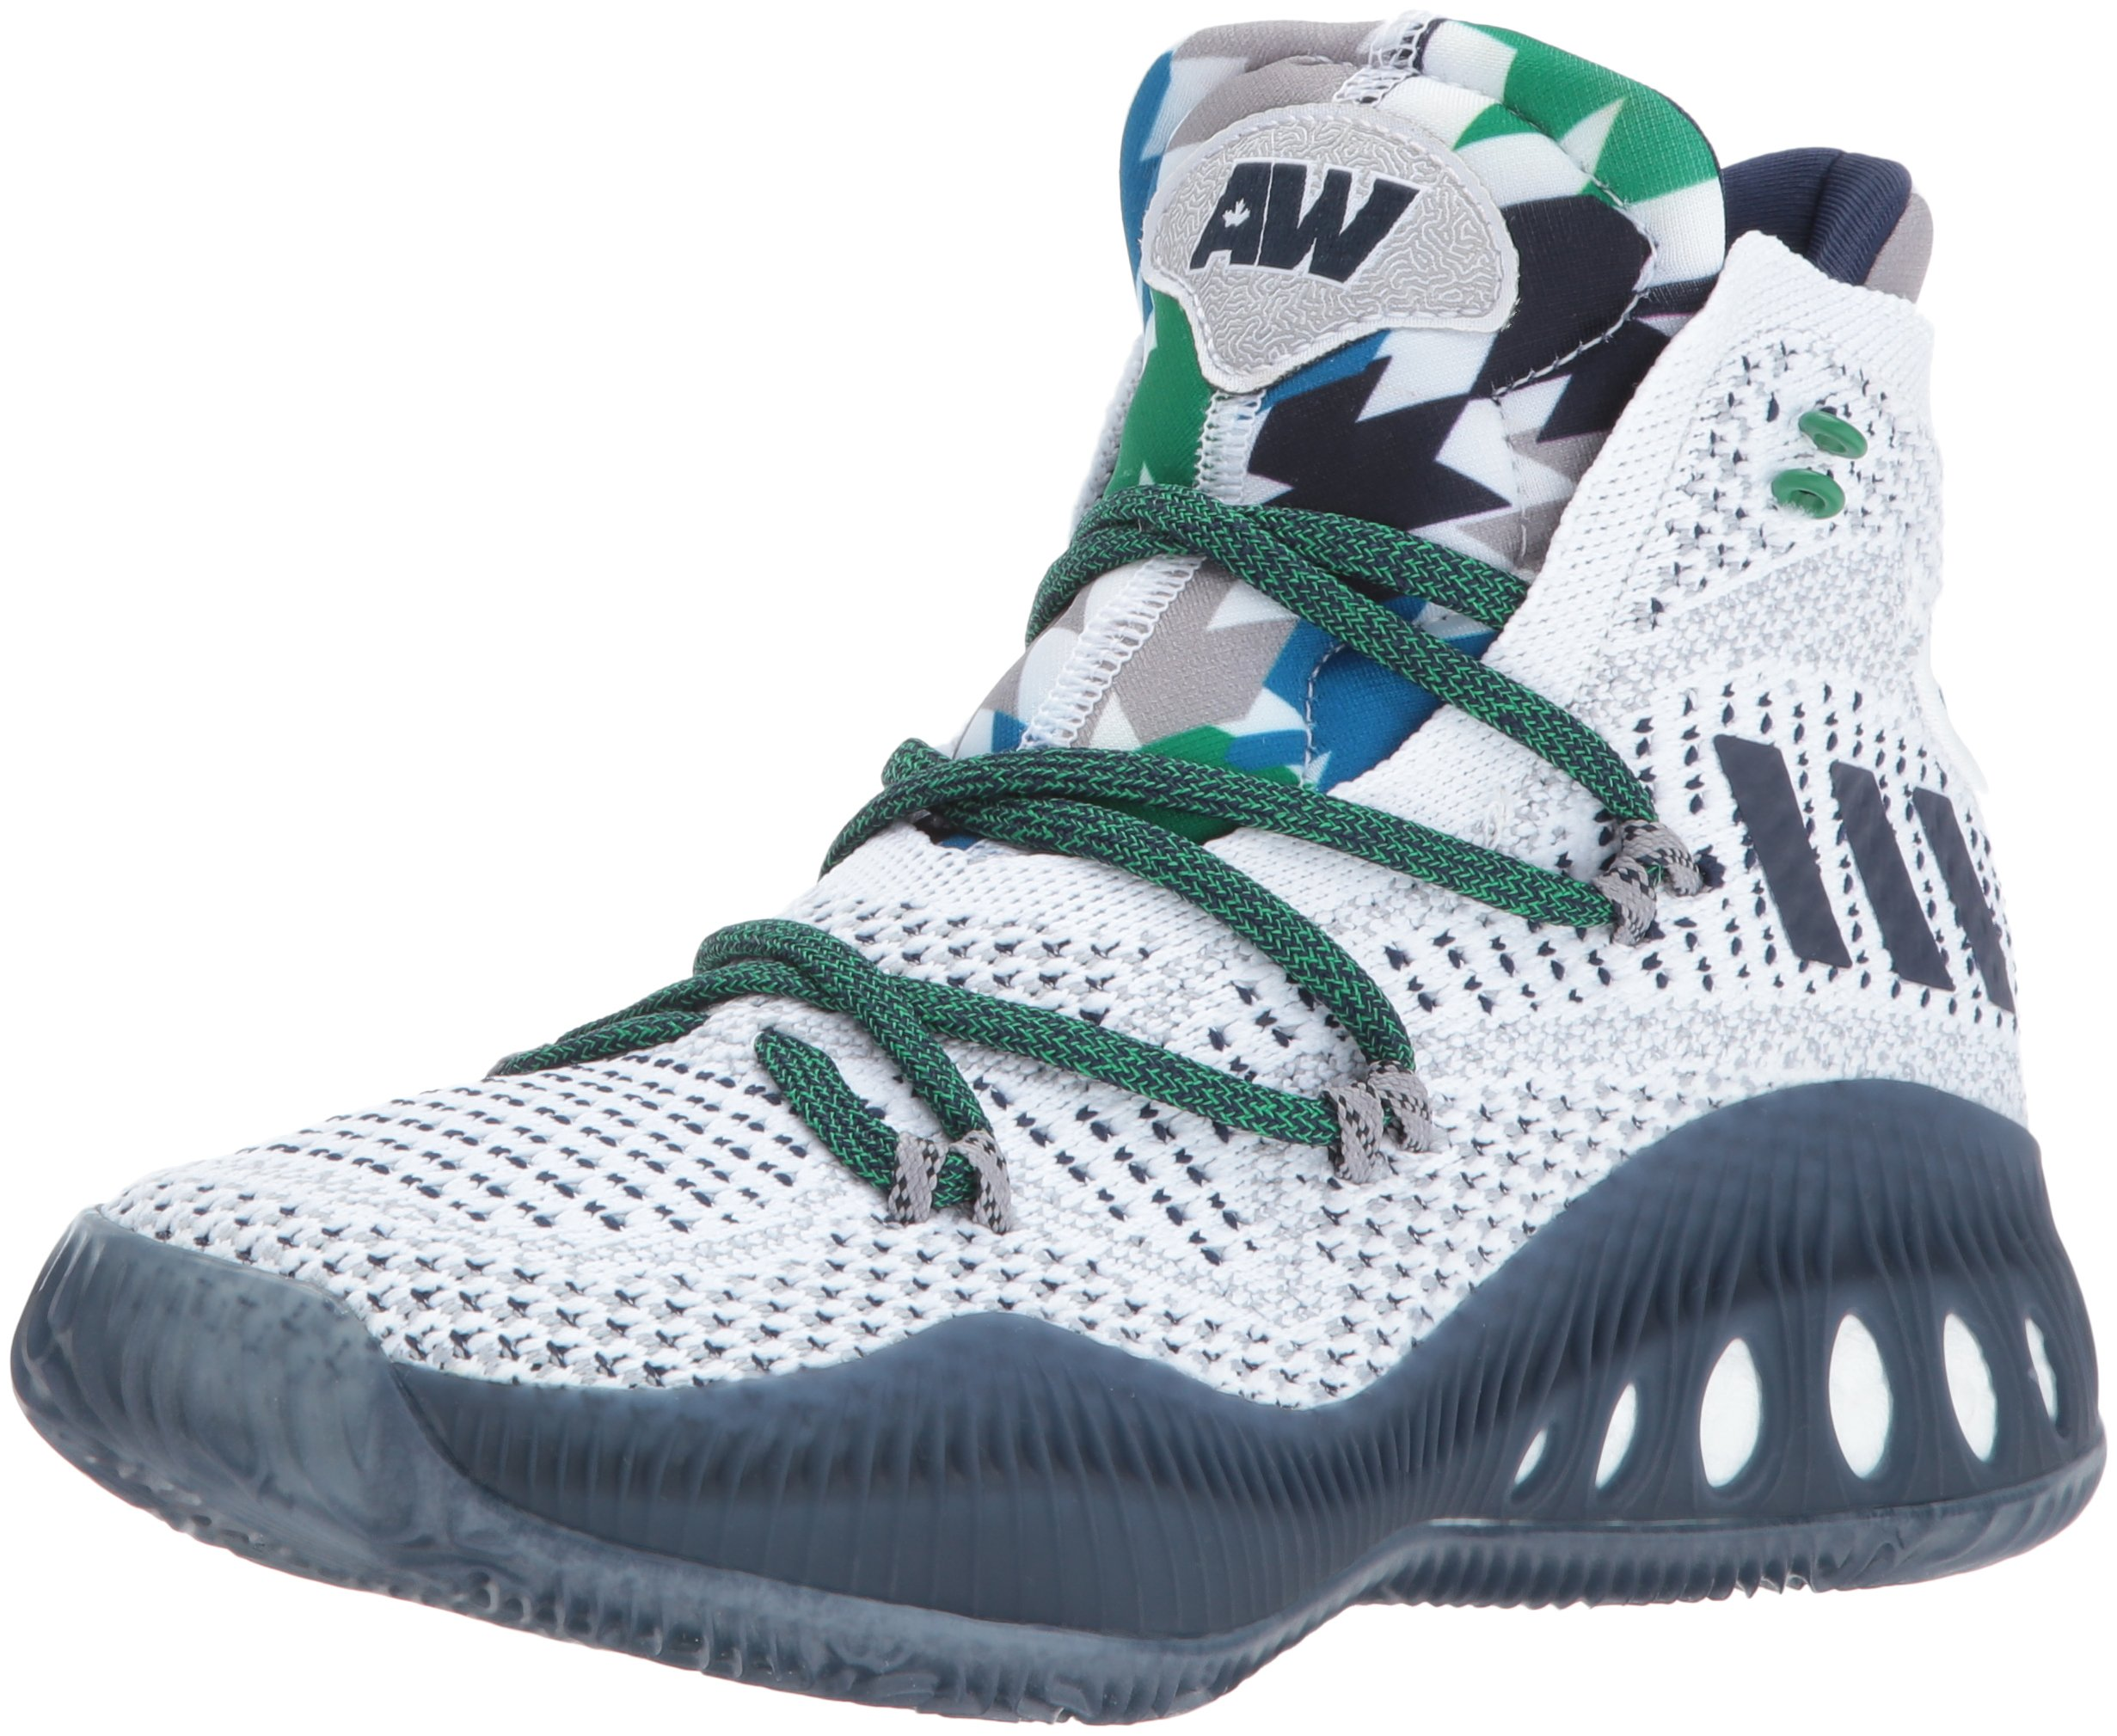 adidas Performance Kid's Shoes   Boy's Crazy Explosive Primeknit Basketball, White/Collegiate Navy/Mgh Solid Grey, (7 M US Big Kid)